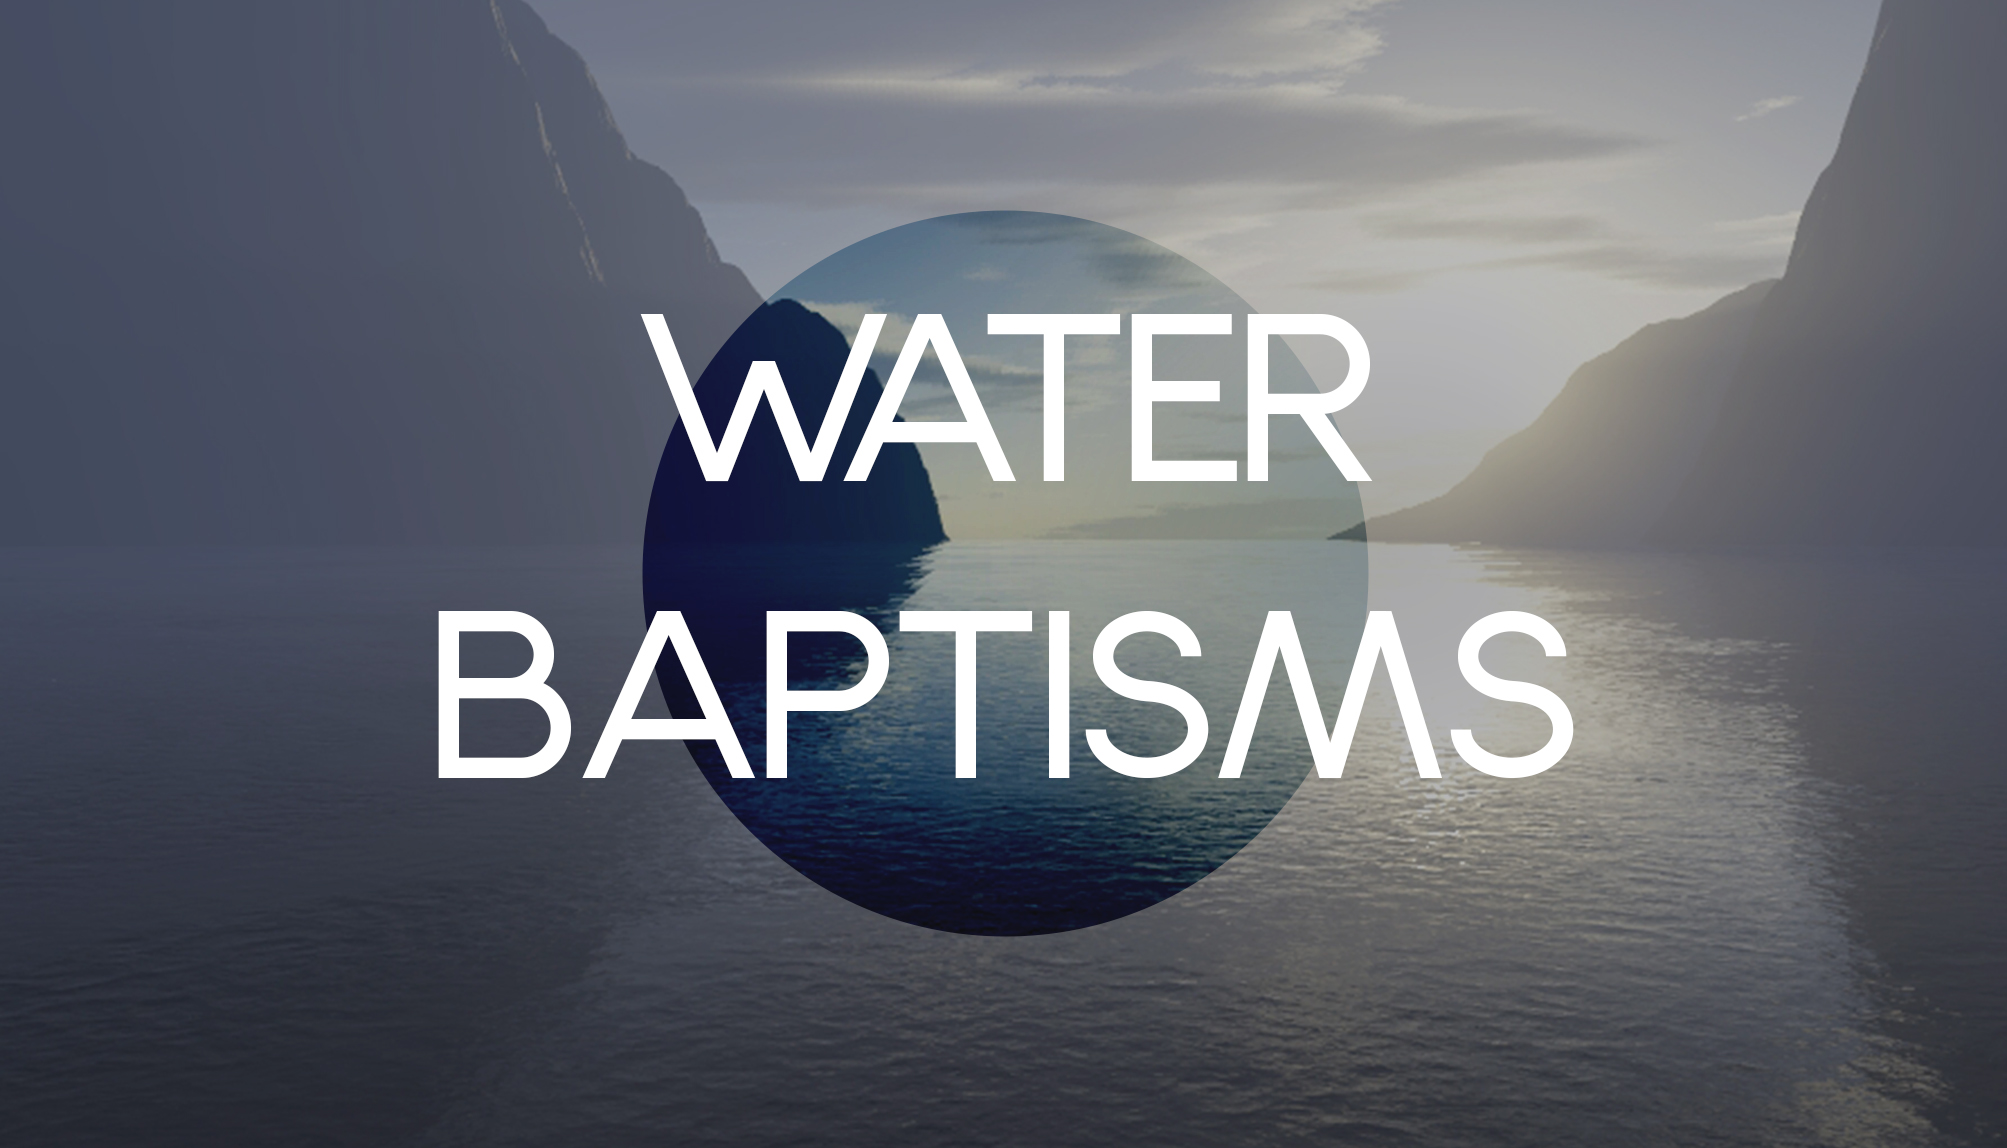 Water baptisms web